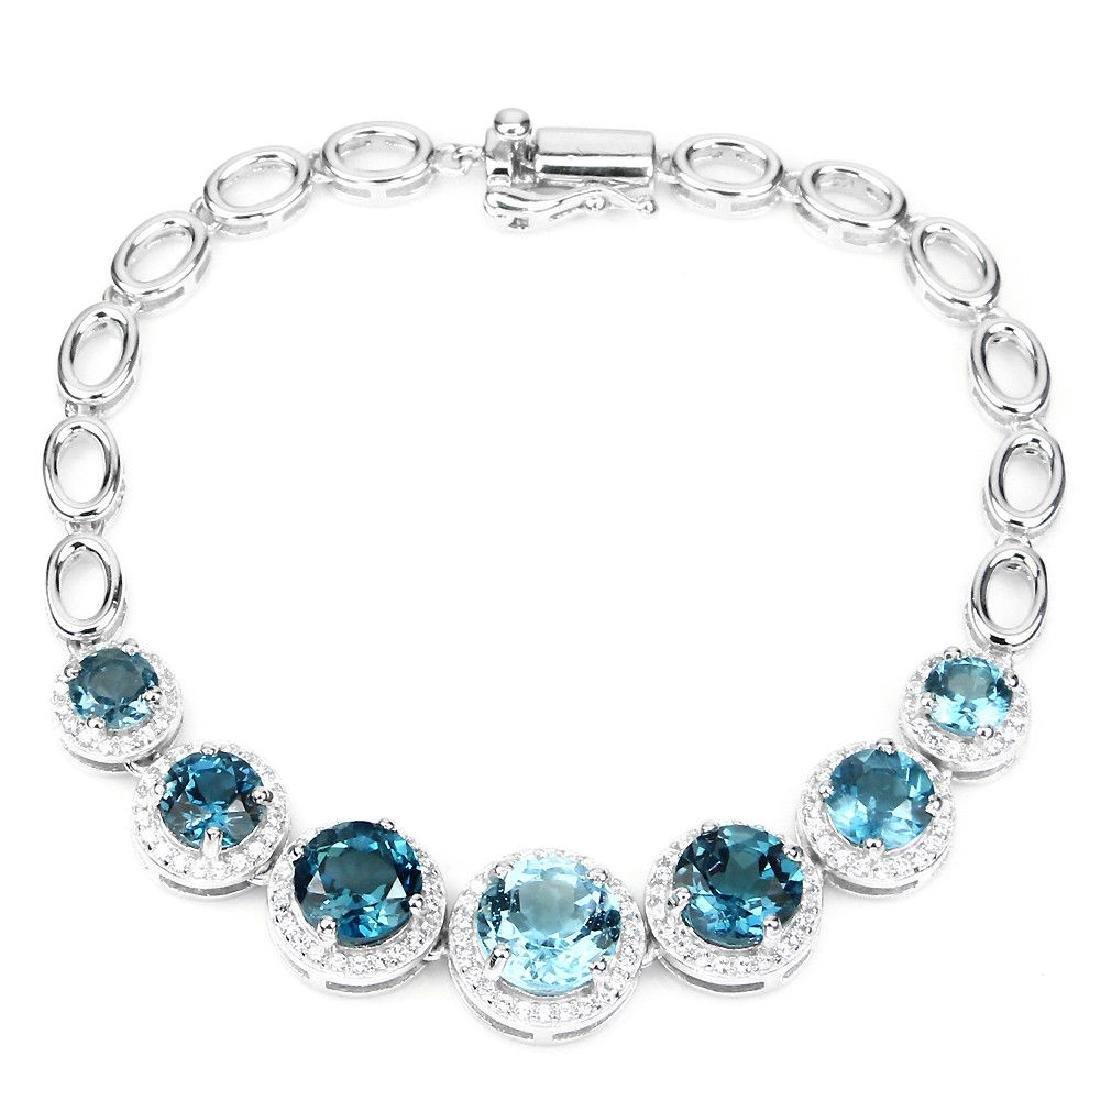 Natural London Blue Topaz Sky Blue Topaz Bracelet - 2